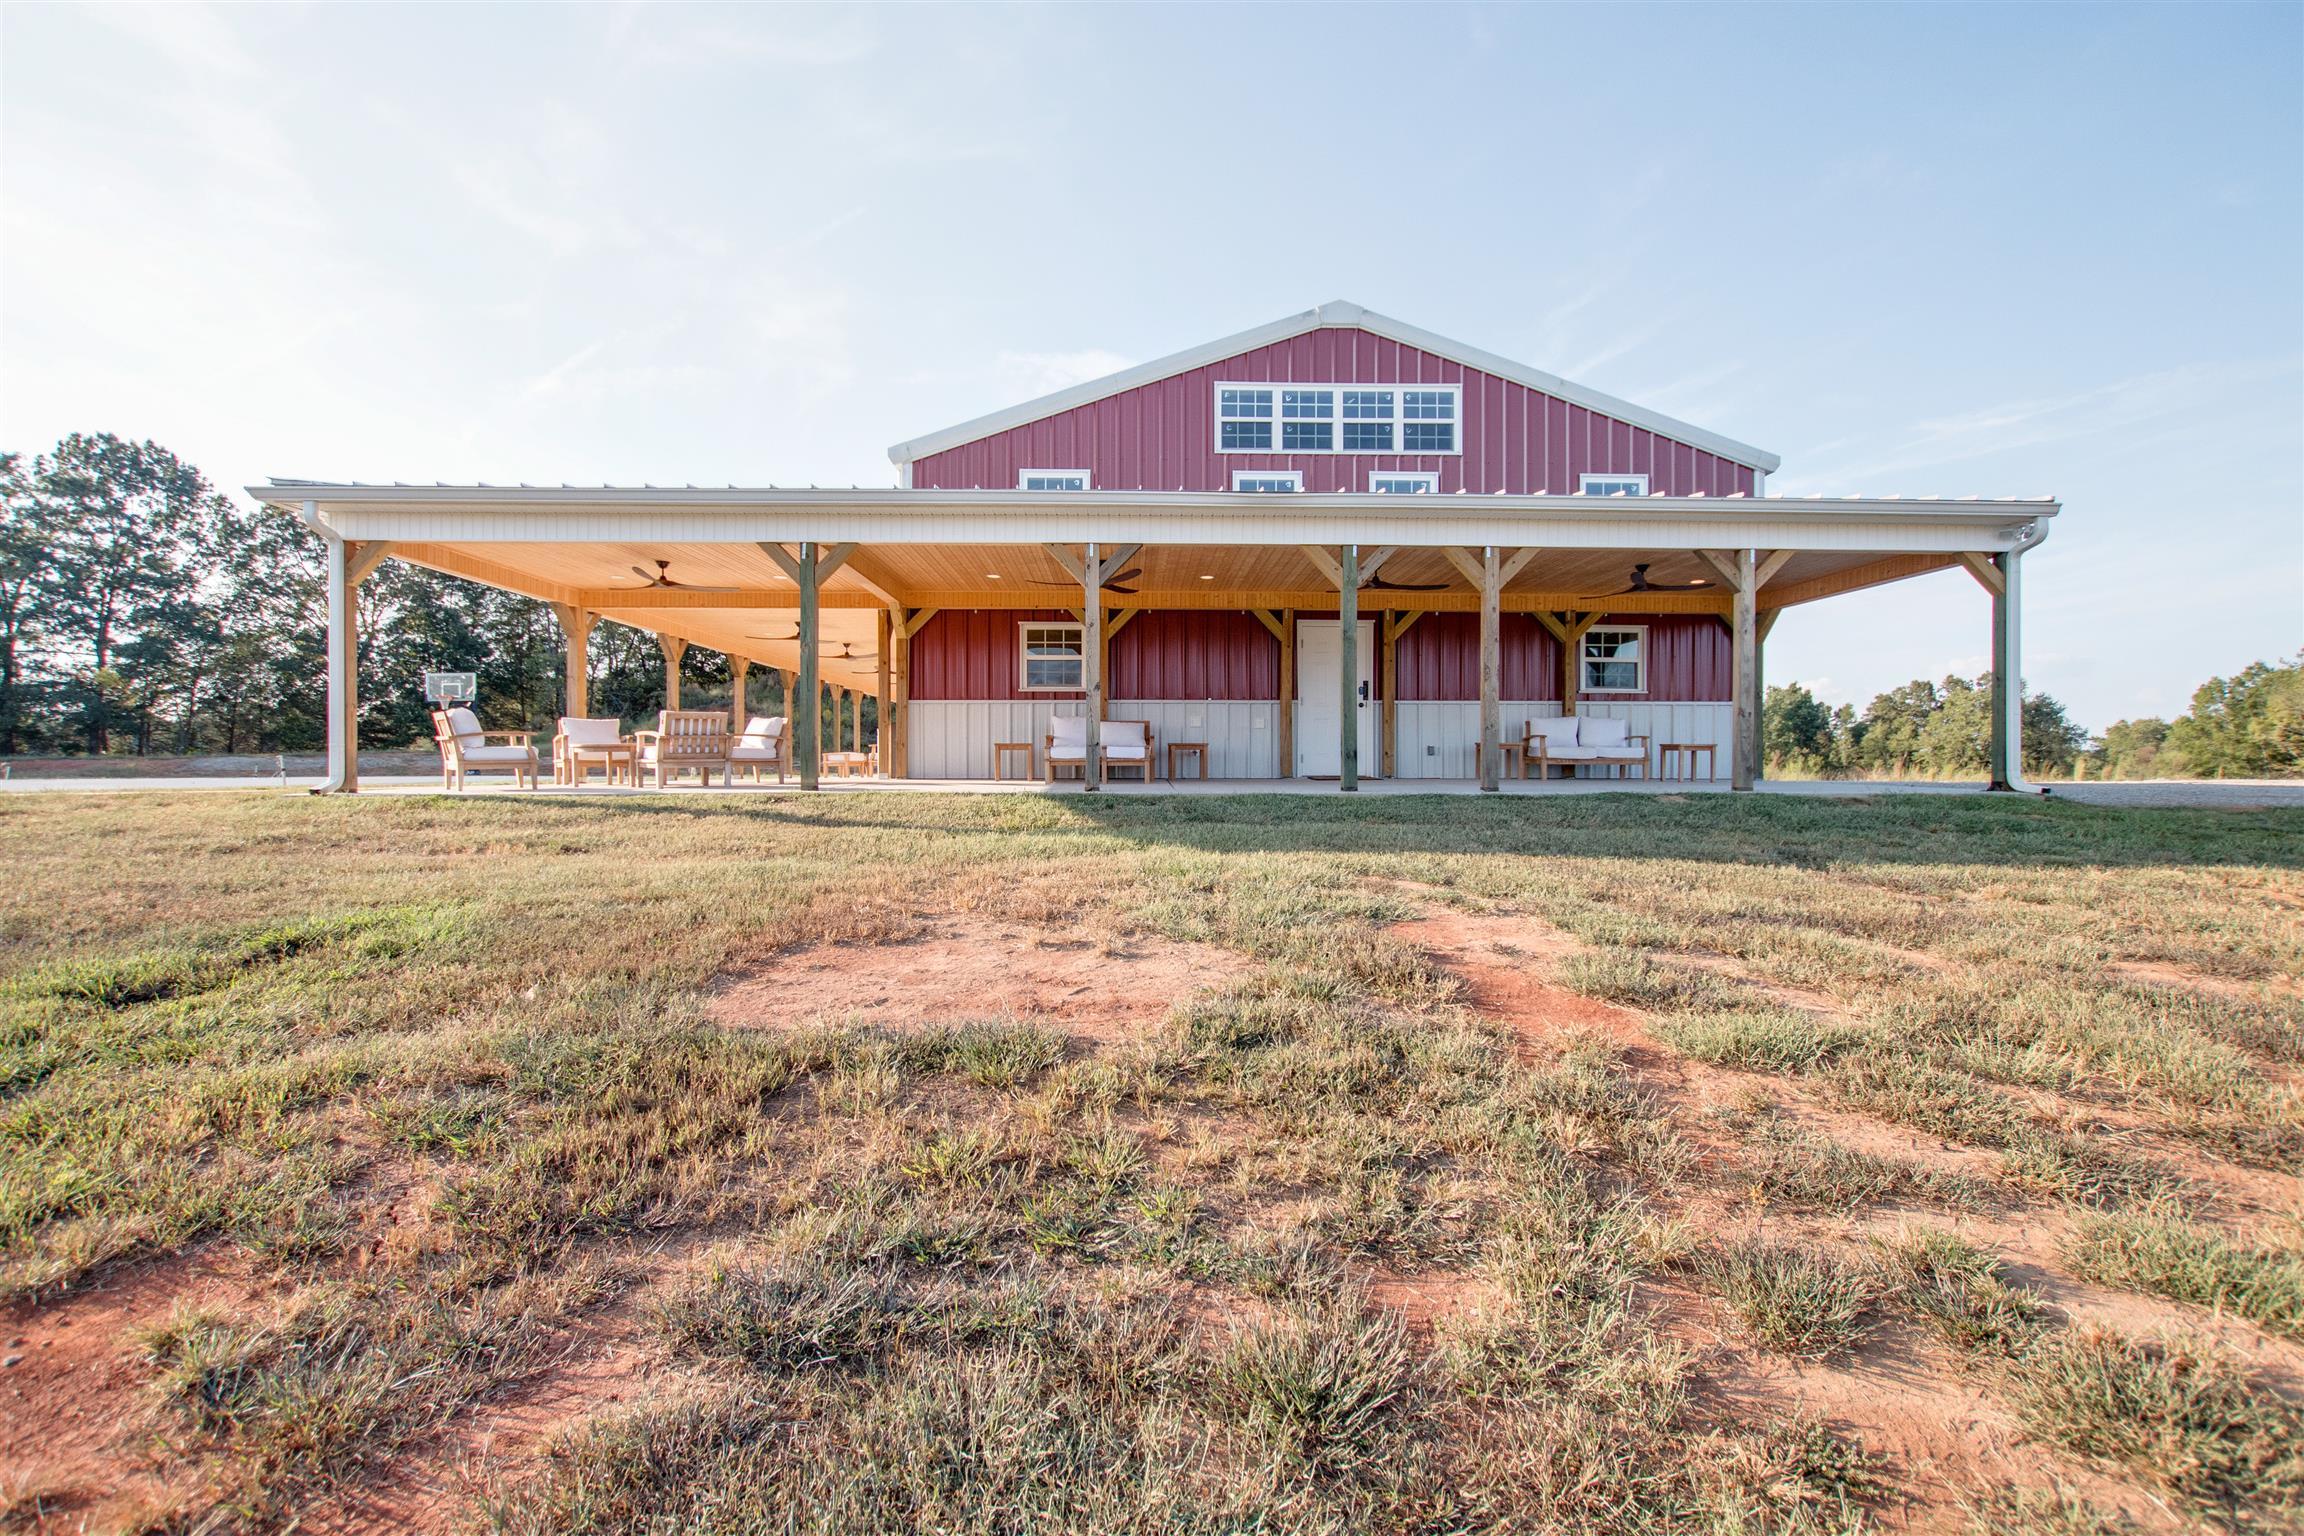 484 McCay Lakeside Ln, Rock Island, TN 38581 - Rock Island, TN real estate listing